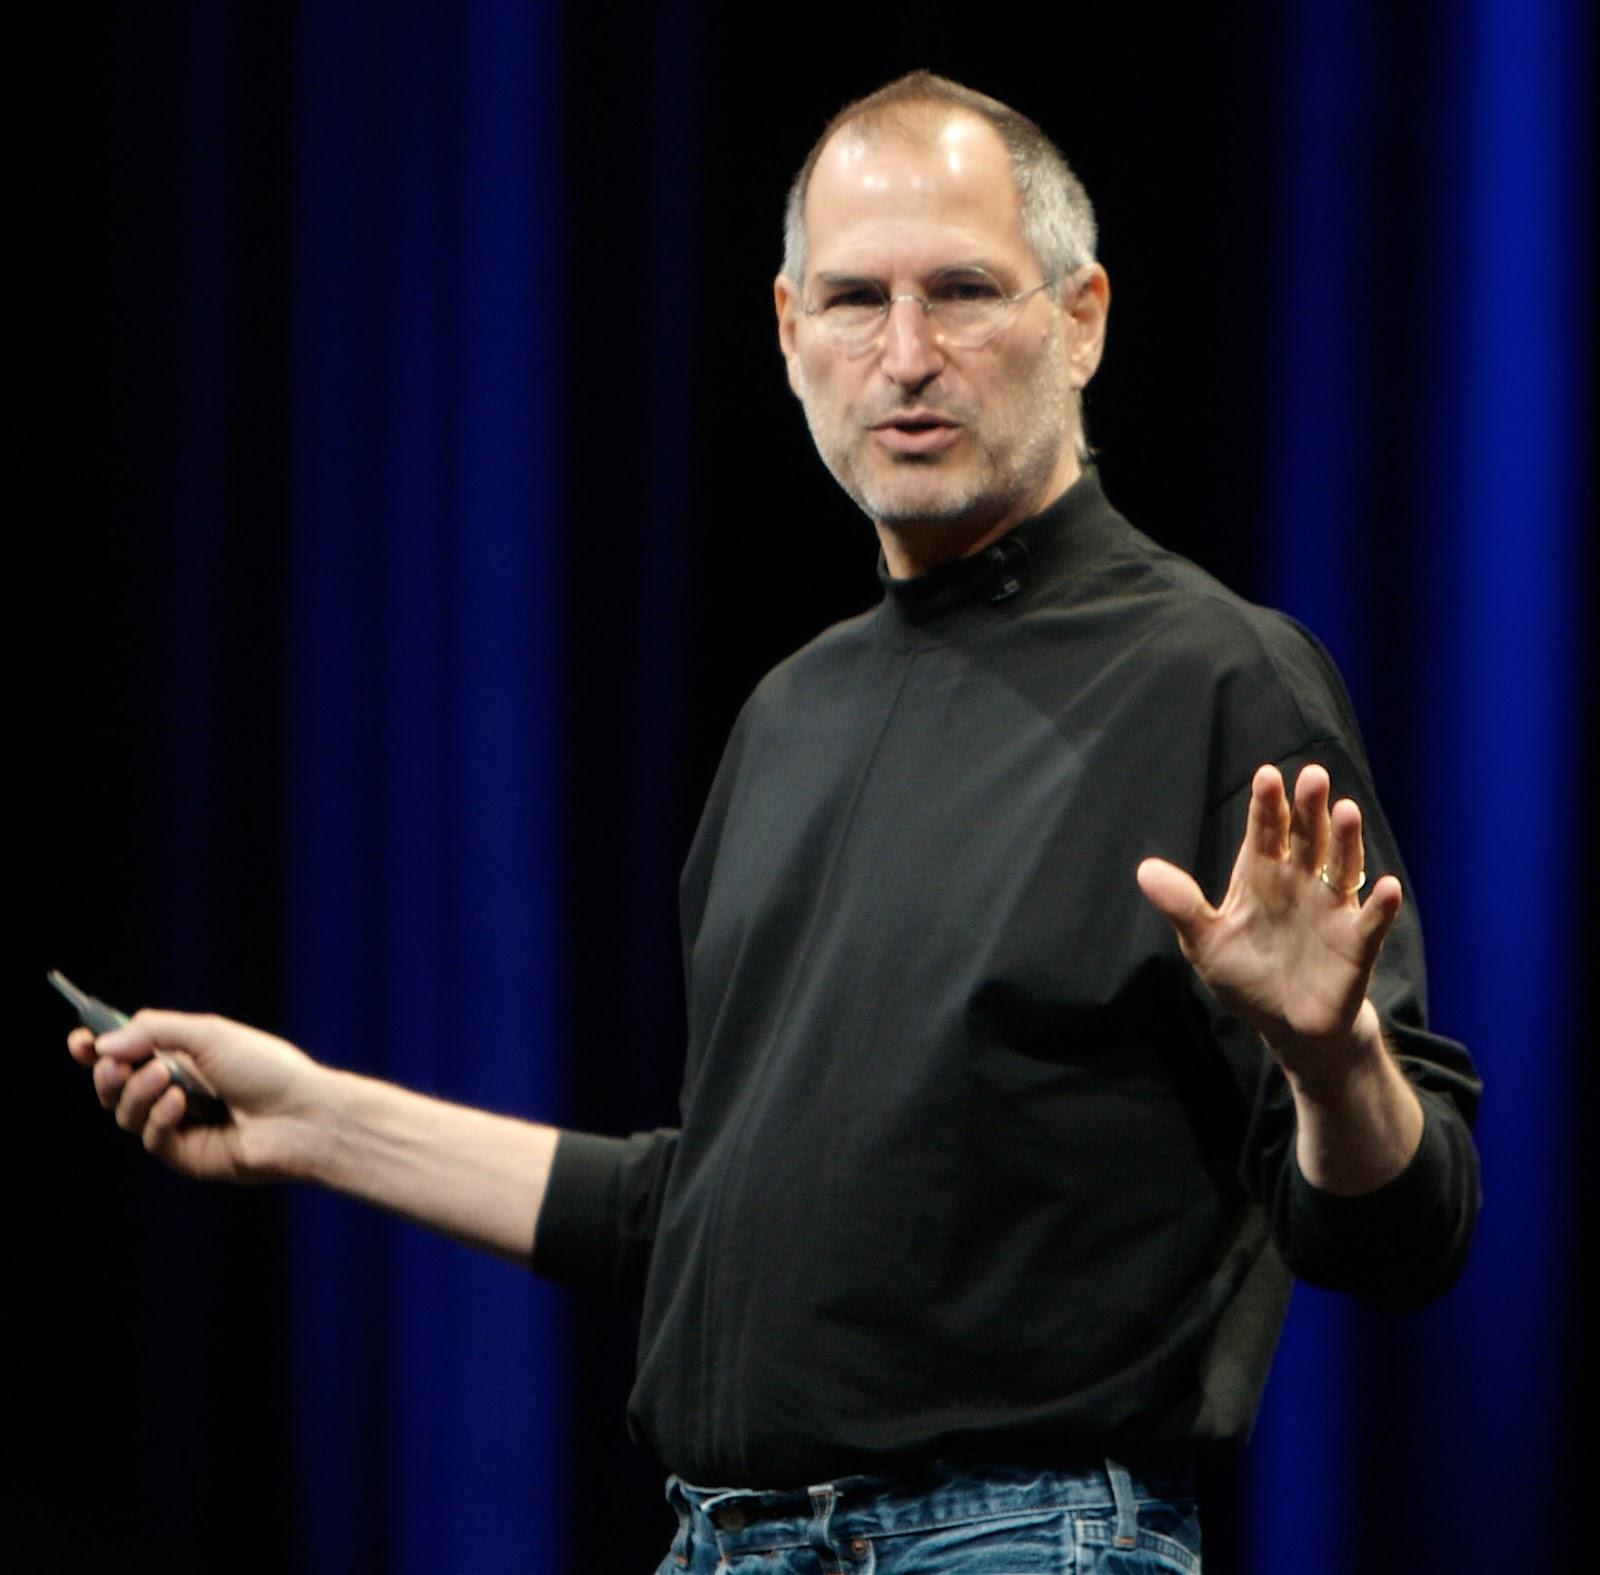 File:Steve Jobs WWDC07.jpg - Wikimedia Commons